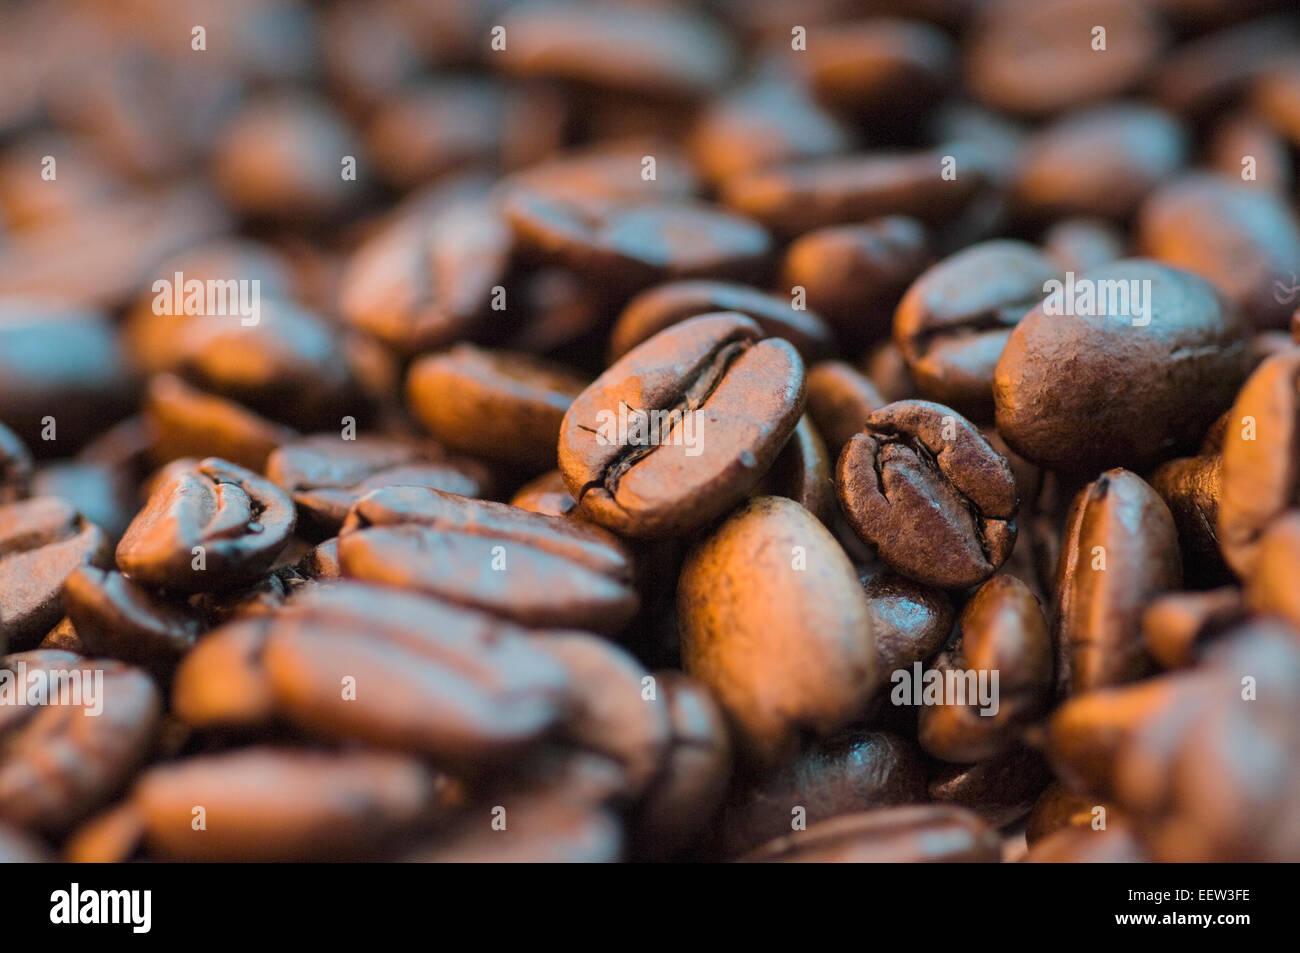 espresso bohnen stockfoto bild 77998242 alamy. Black Bedroom Furniture Sets. Home Design Ideas